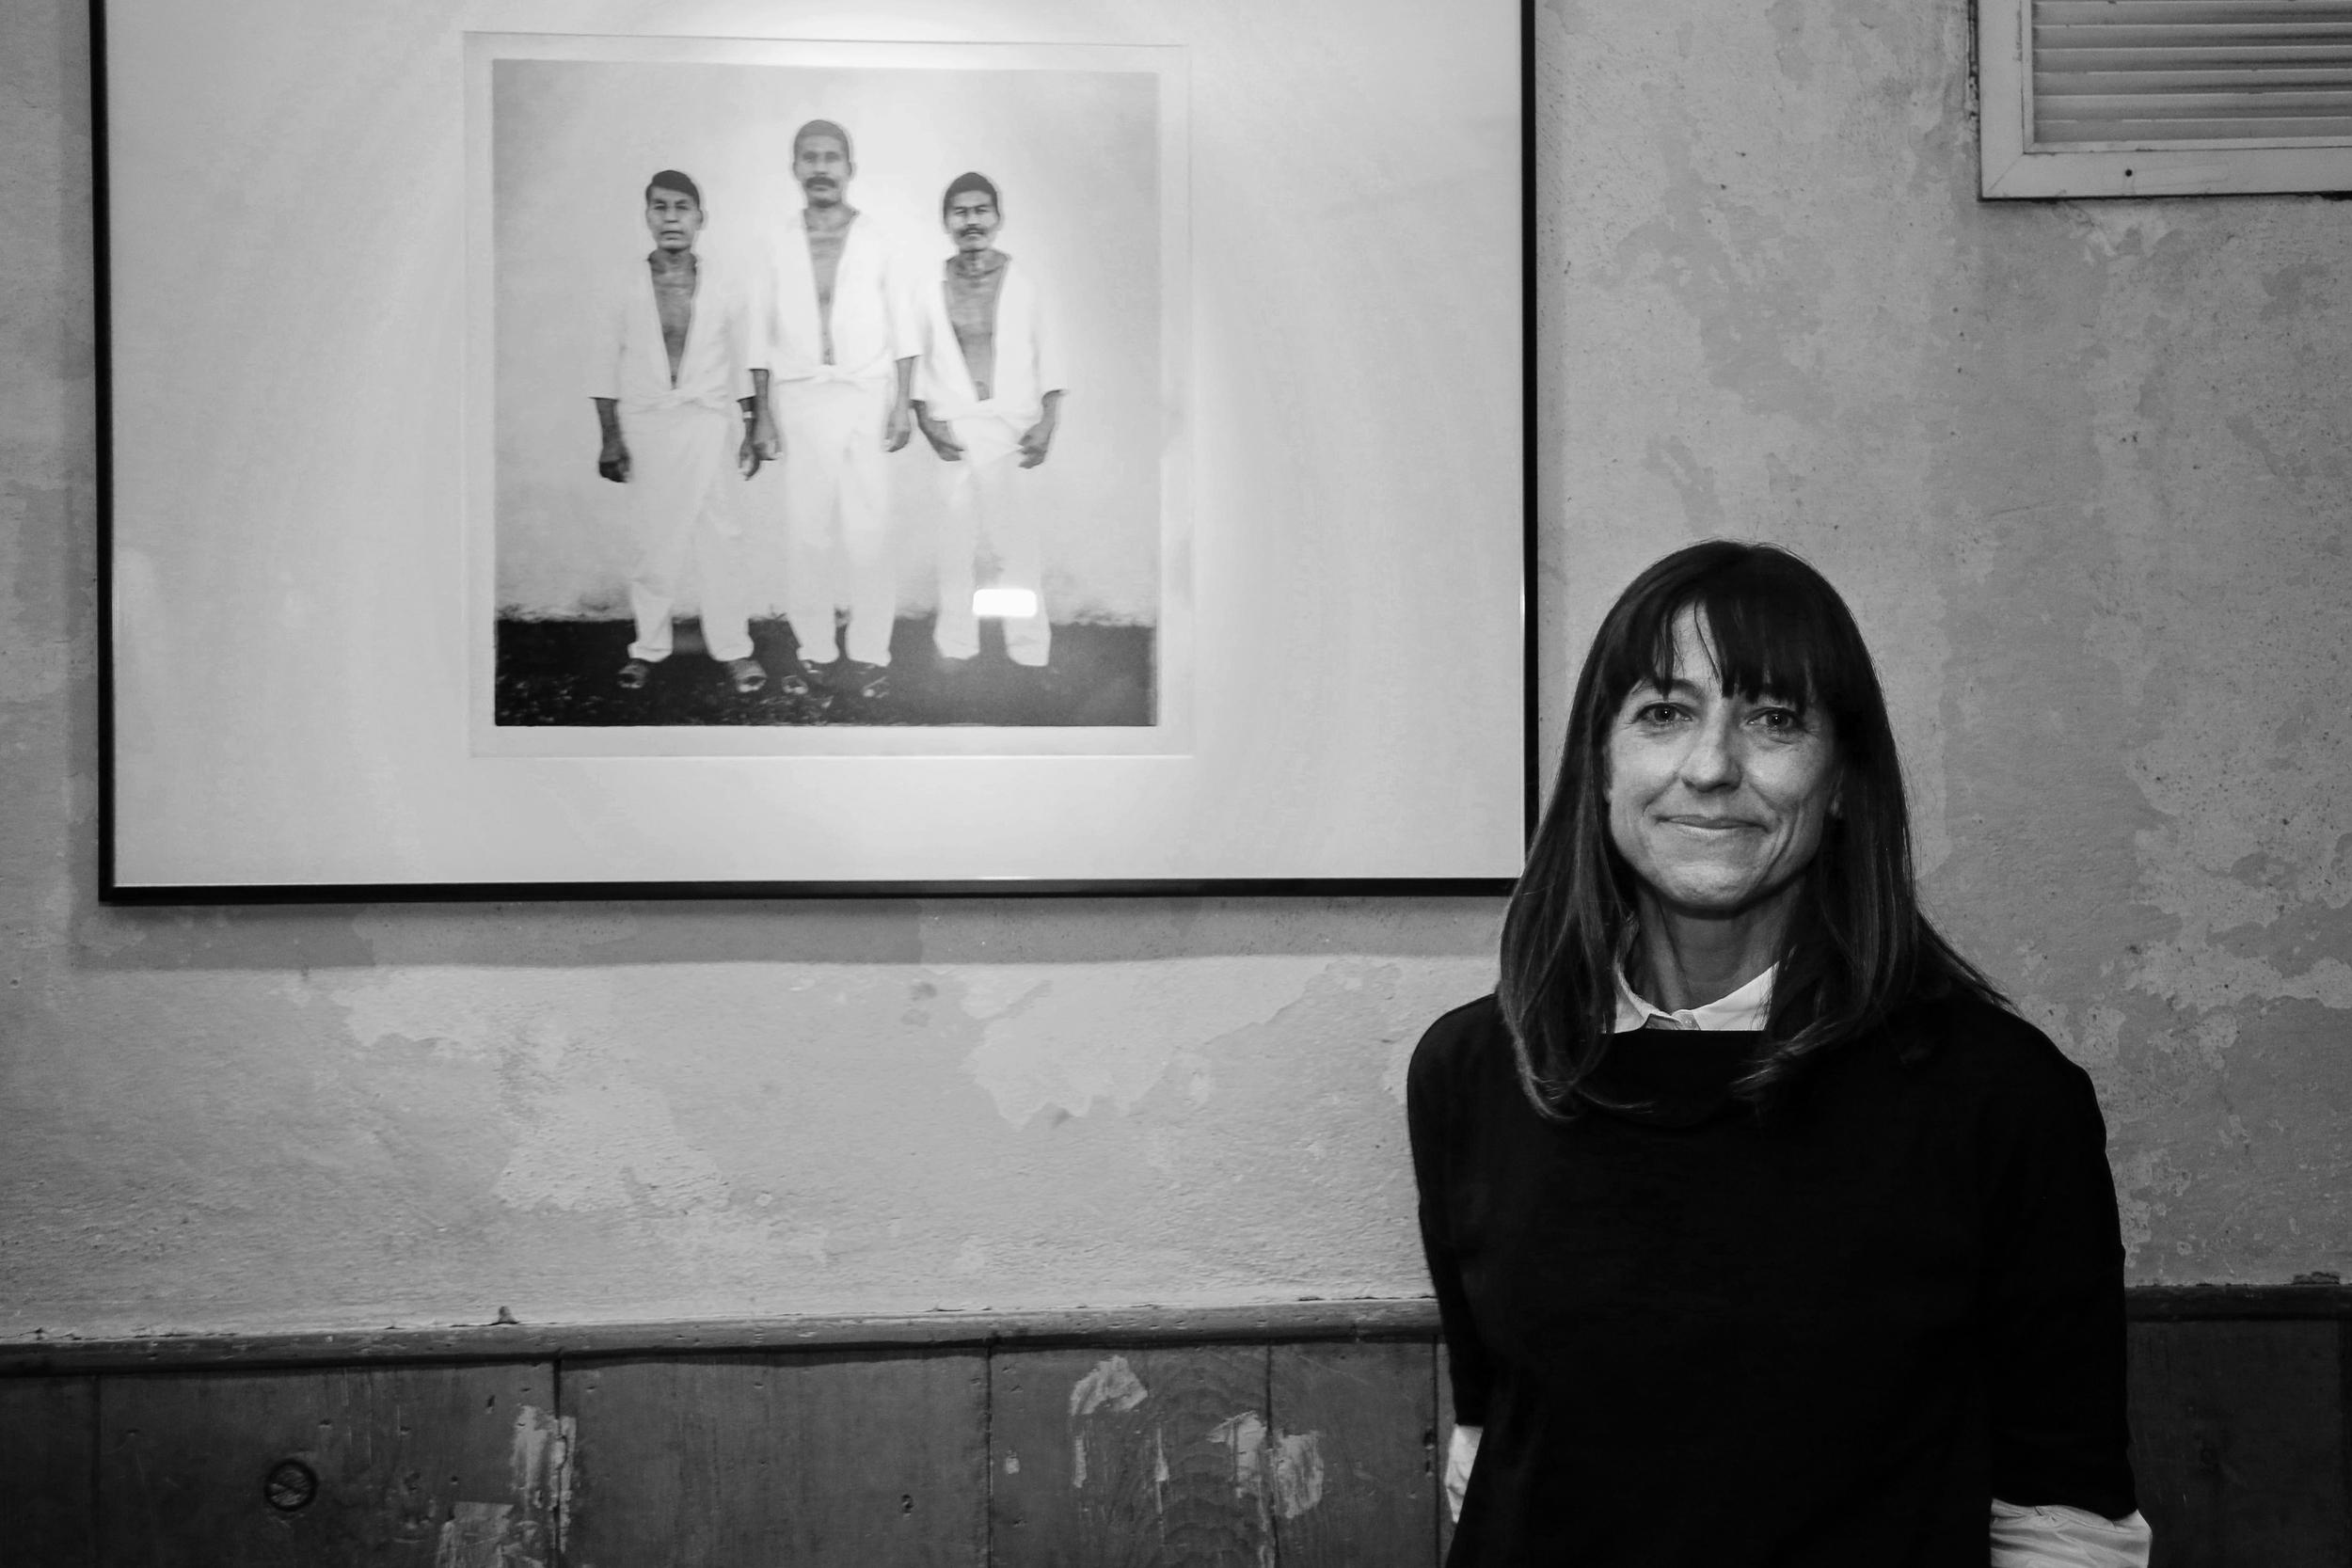 Adriana Zehbrauskas, Photograph ©Nora Wilby